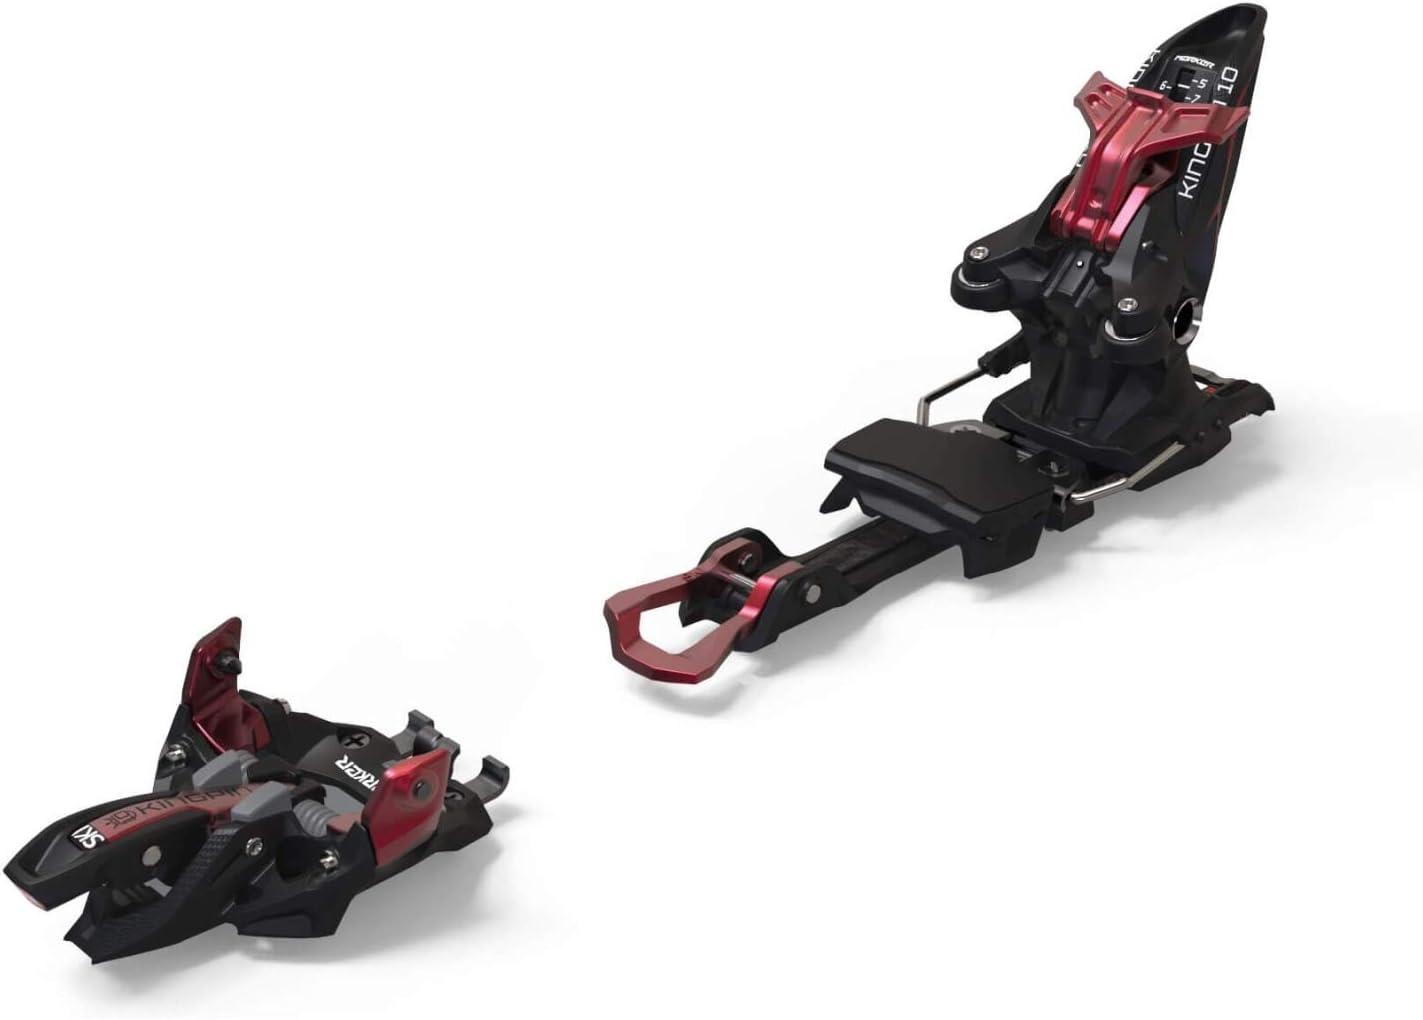 sale Marker Kingpin 10 Ski 2020 Bindings Arlington Mall